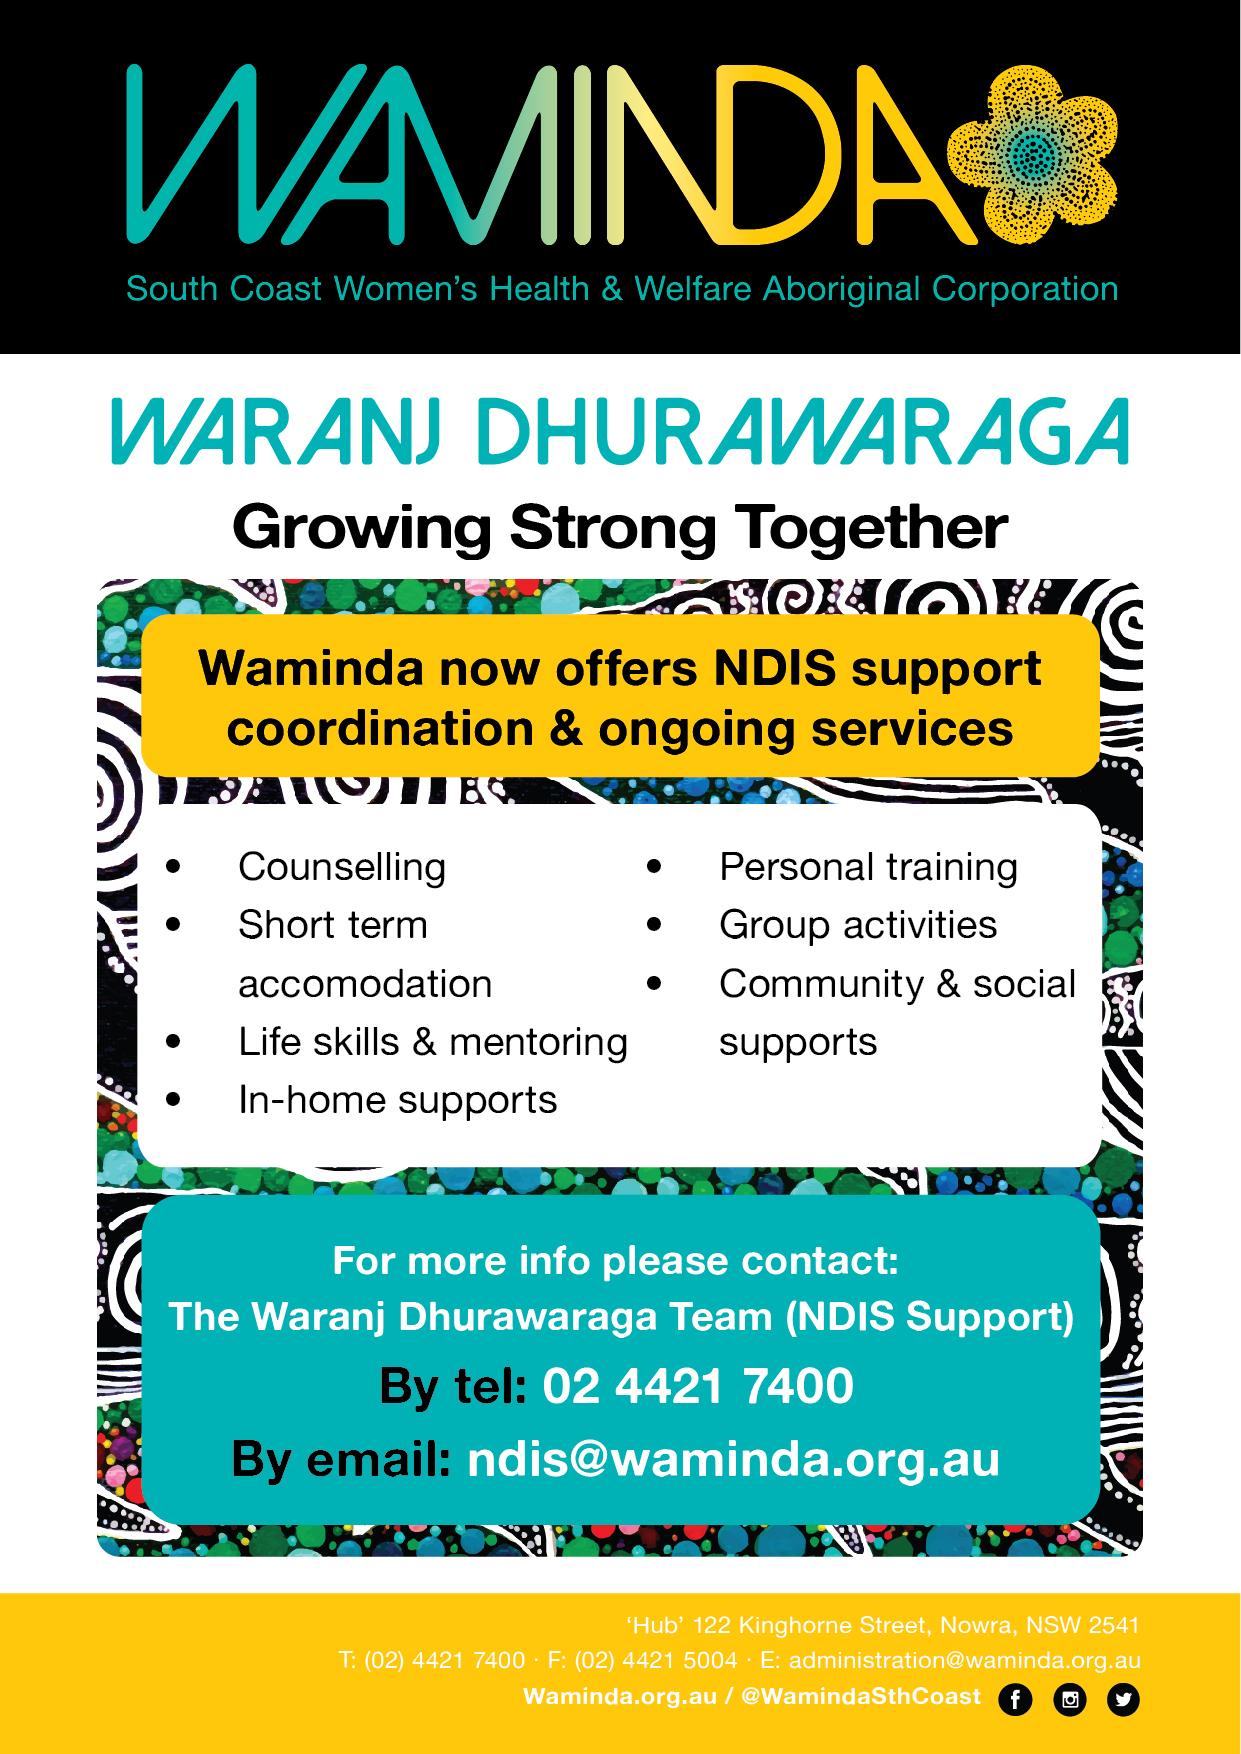 NDIS V5 WEB A4 02.07.19 Waranj Dhurawaraga flyer-01.jpg